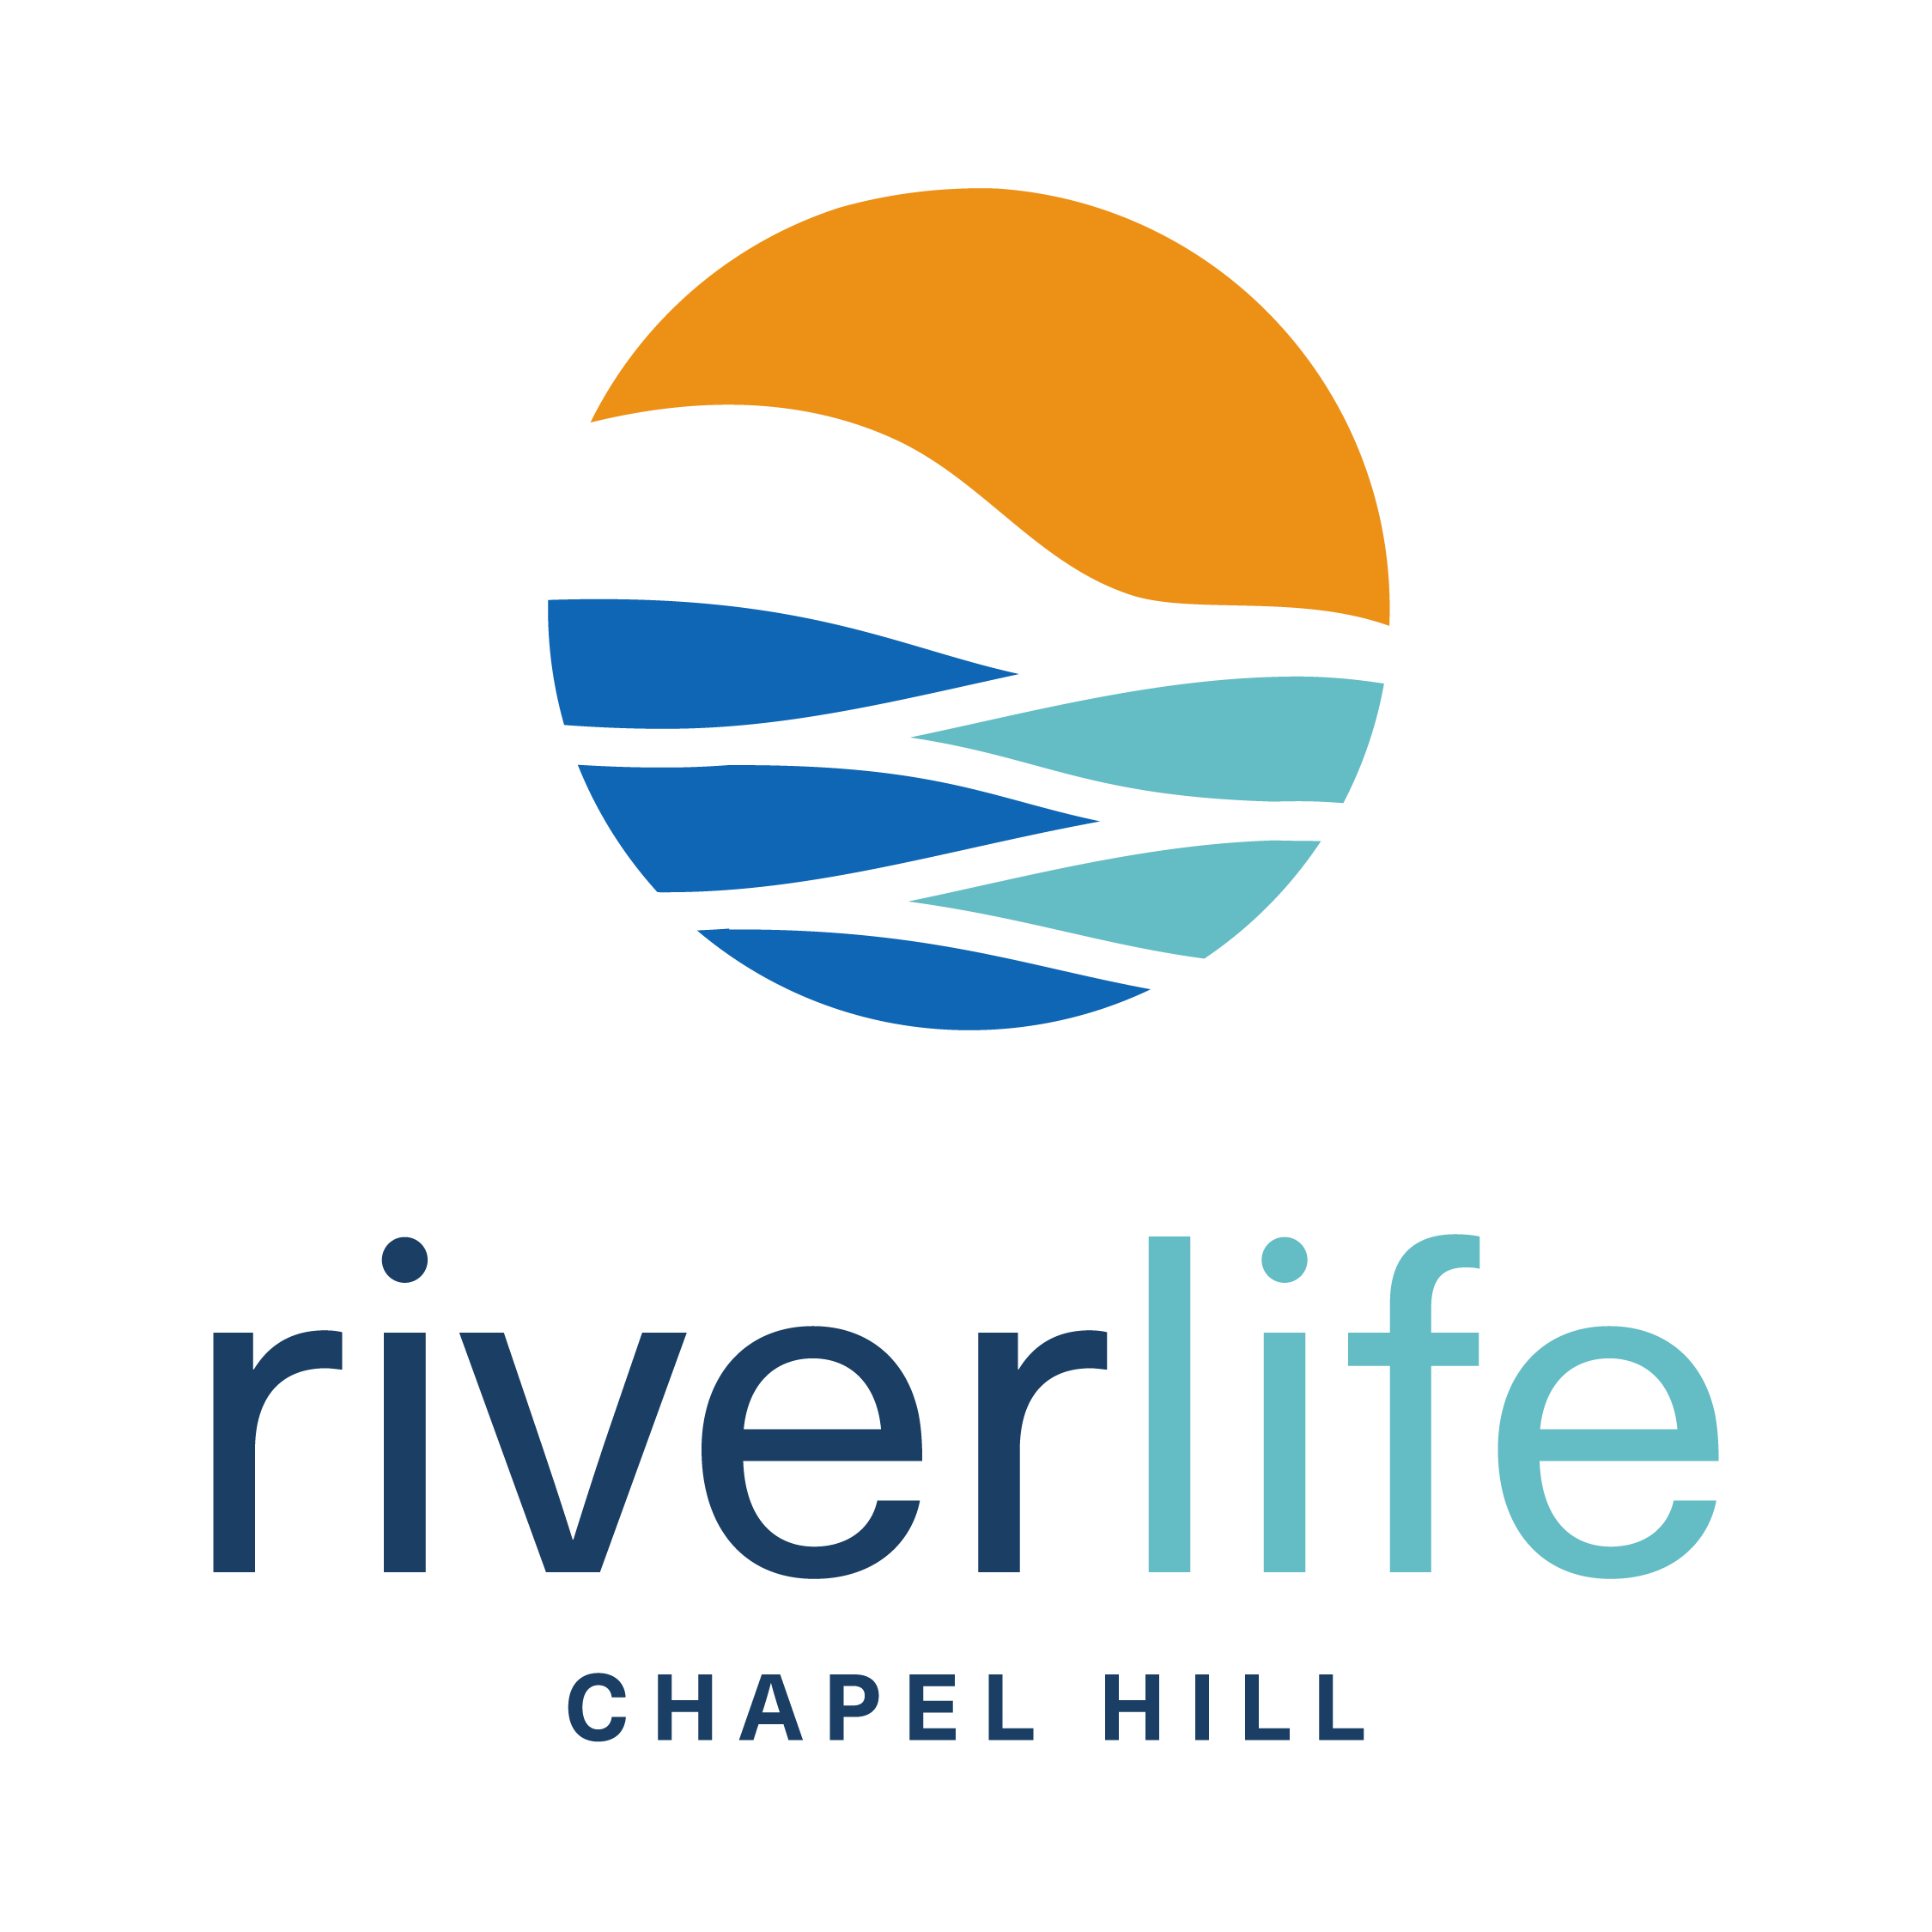 RiverLife-ChapelHill-Logos-03